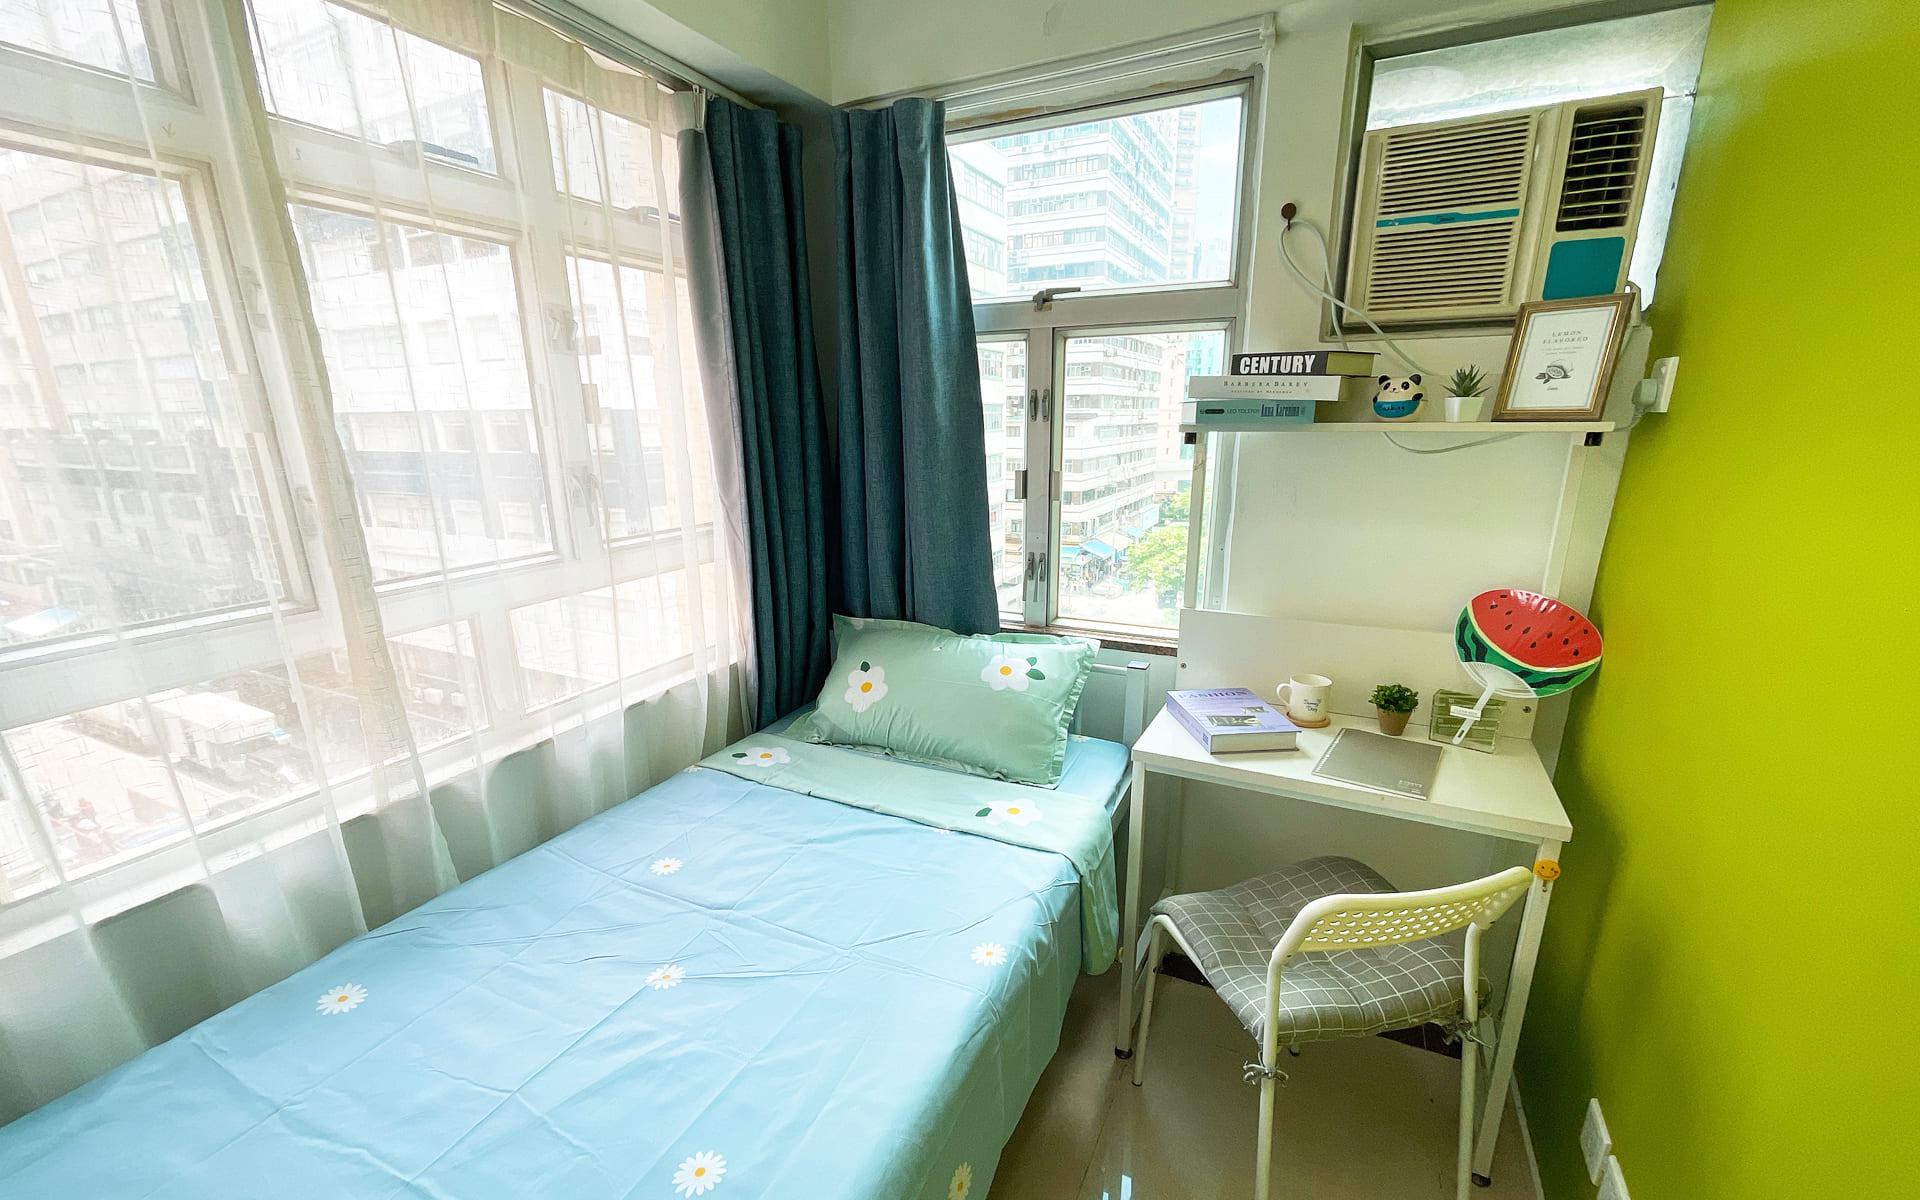 hk_service_apartment_13820766981629432910.jpg